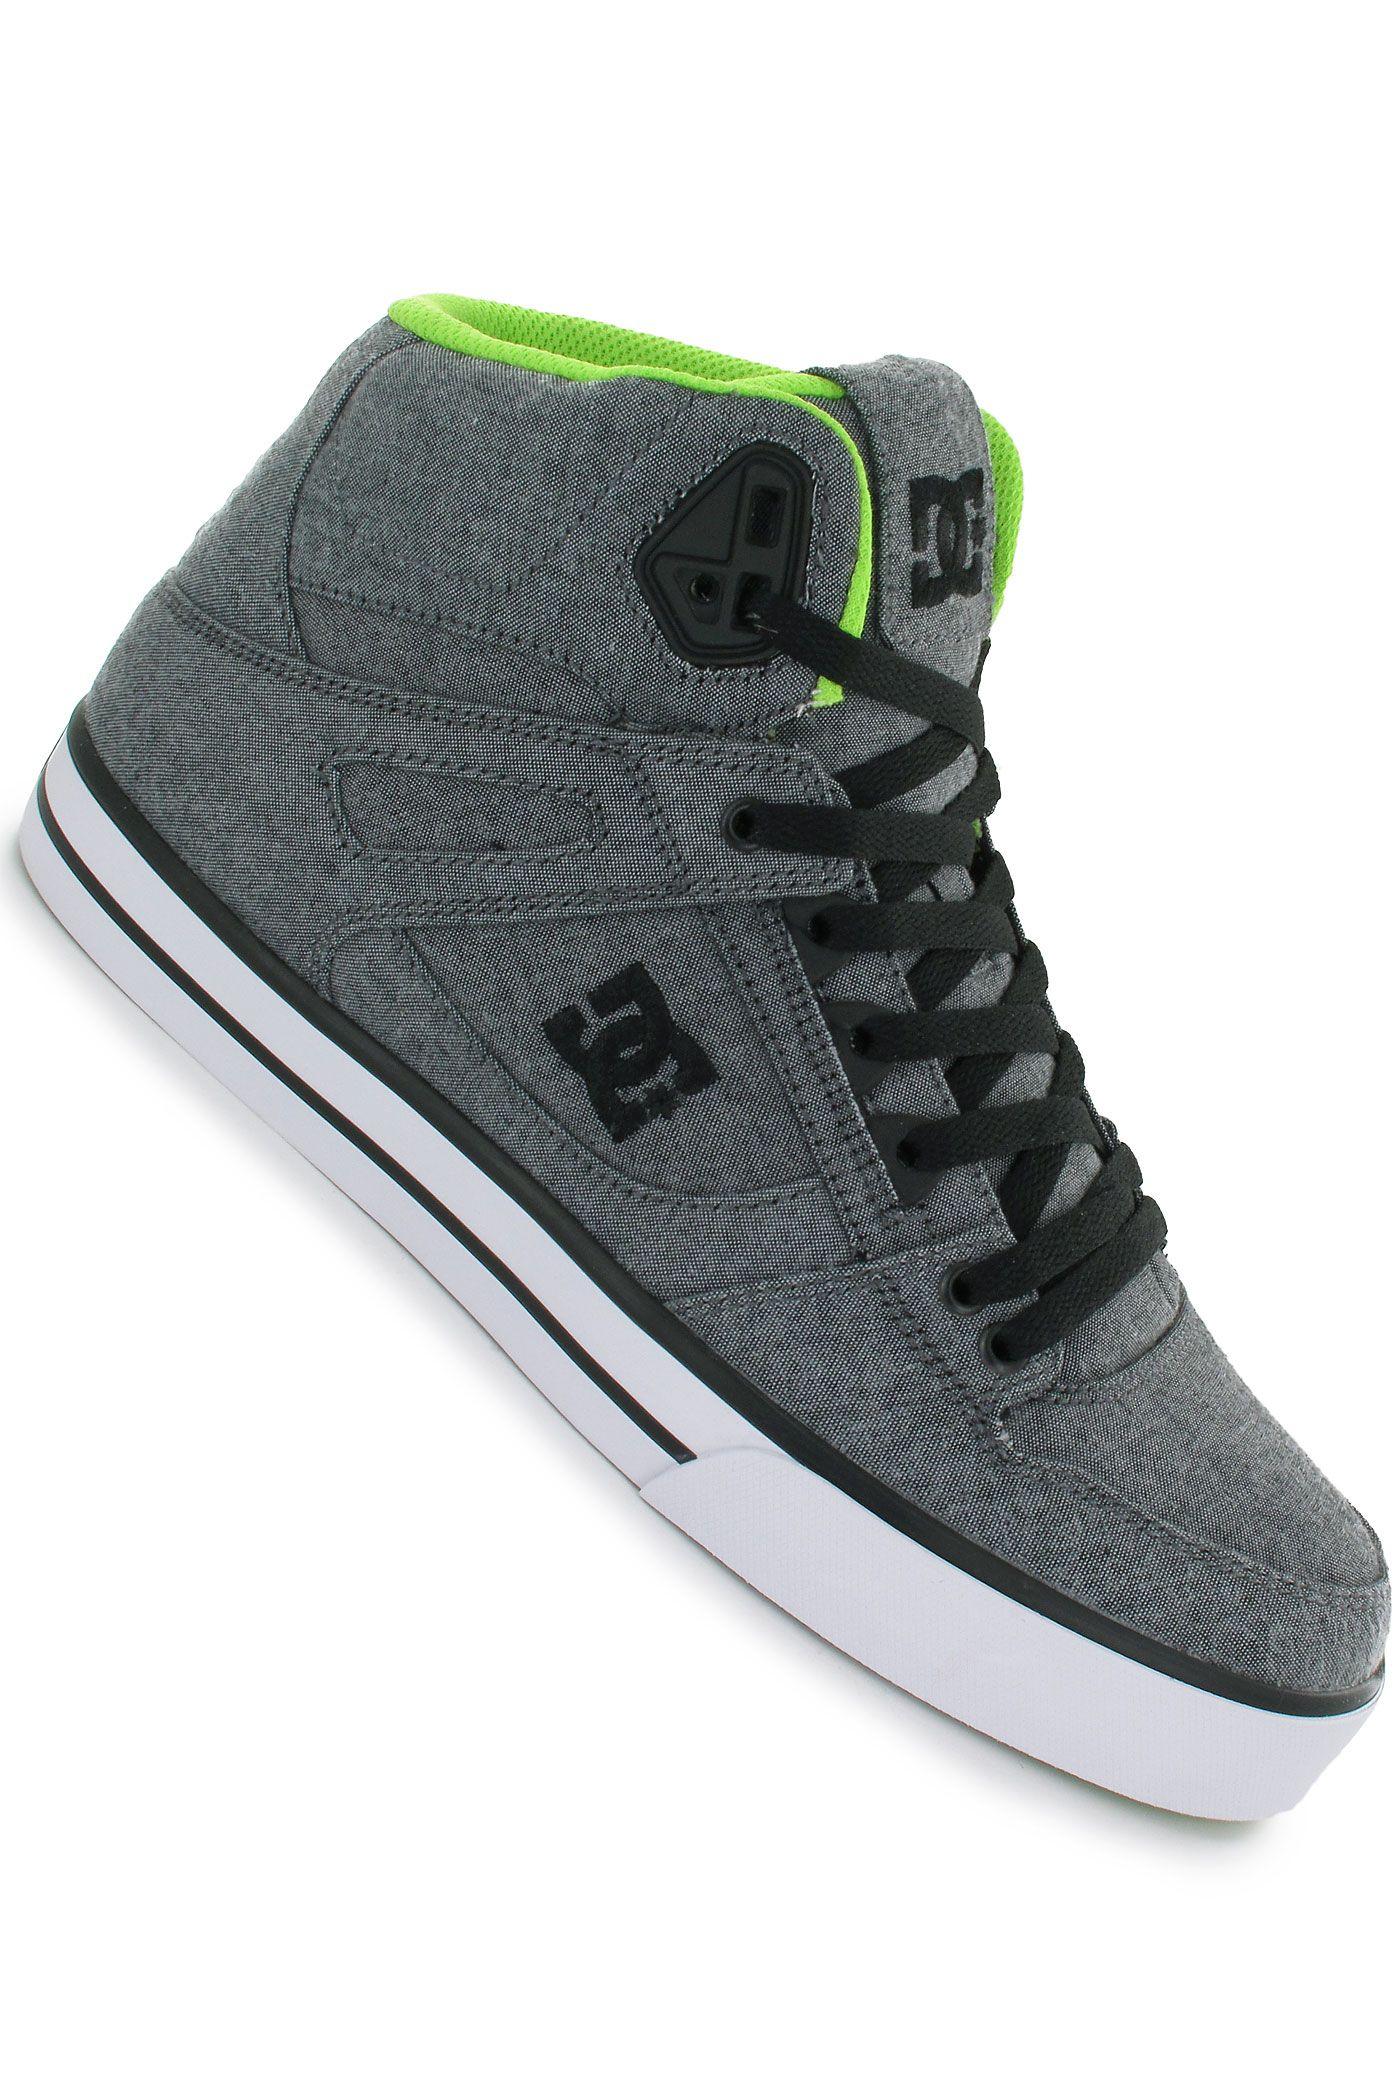 DC Spartan High WC TX SE Chaussure (grey resin rinse)